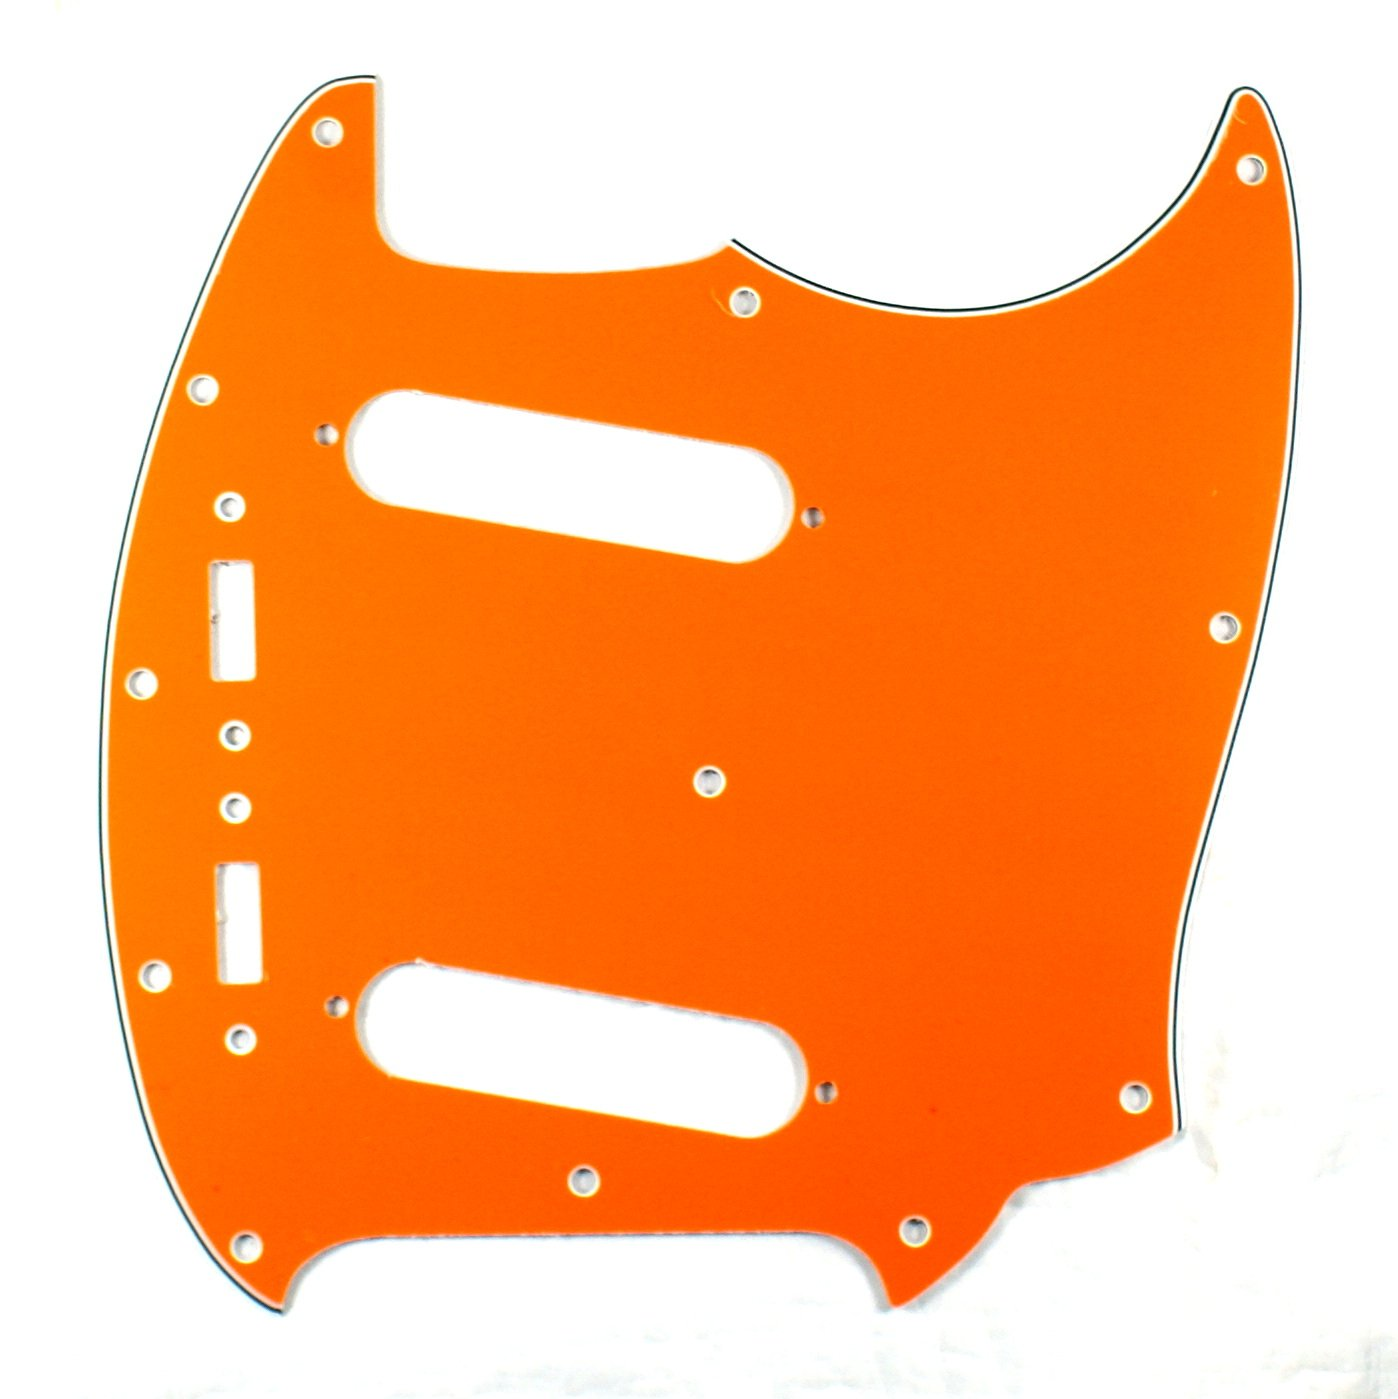 Custom Guitar Pickguard Fits Mustang Classic Series E66 4 Ply Orange